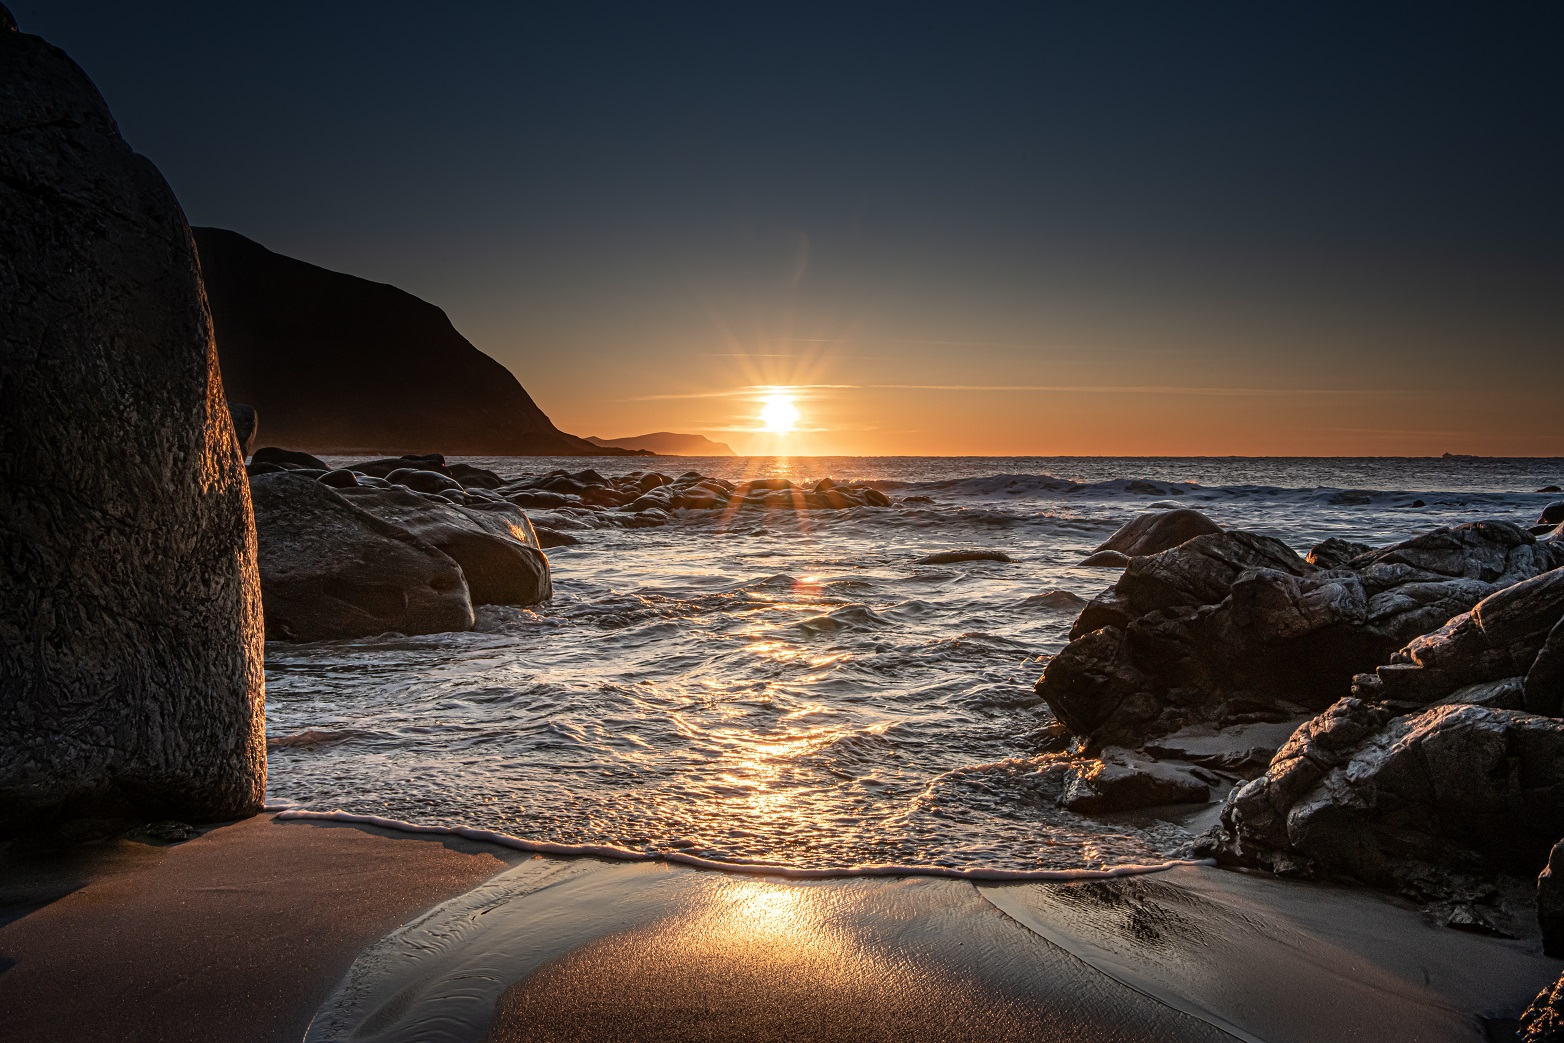 Solnedgang-strand-Runde-Havlandet-Fosnavaag-reisegude-reiseapp-lydguide-app-mobilguide-Voice-Of-Norway-Fotograf-Kristoffer-Ytterland